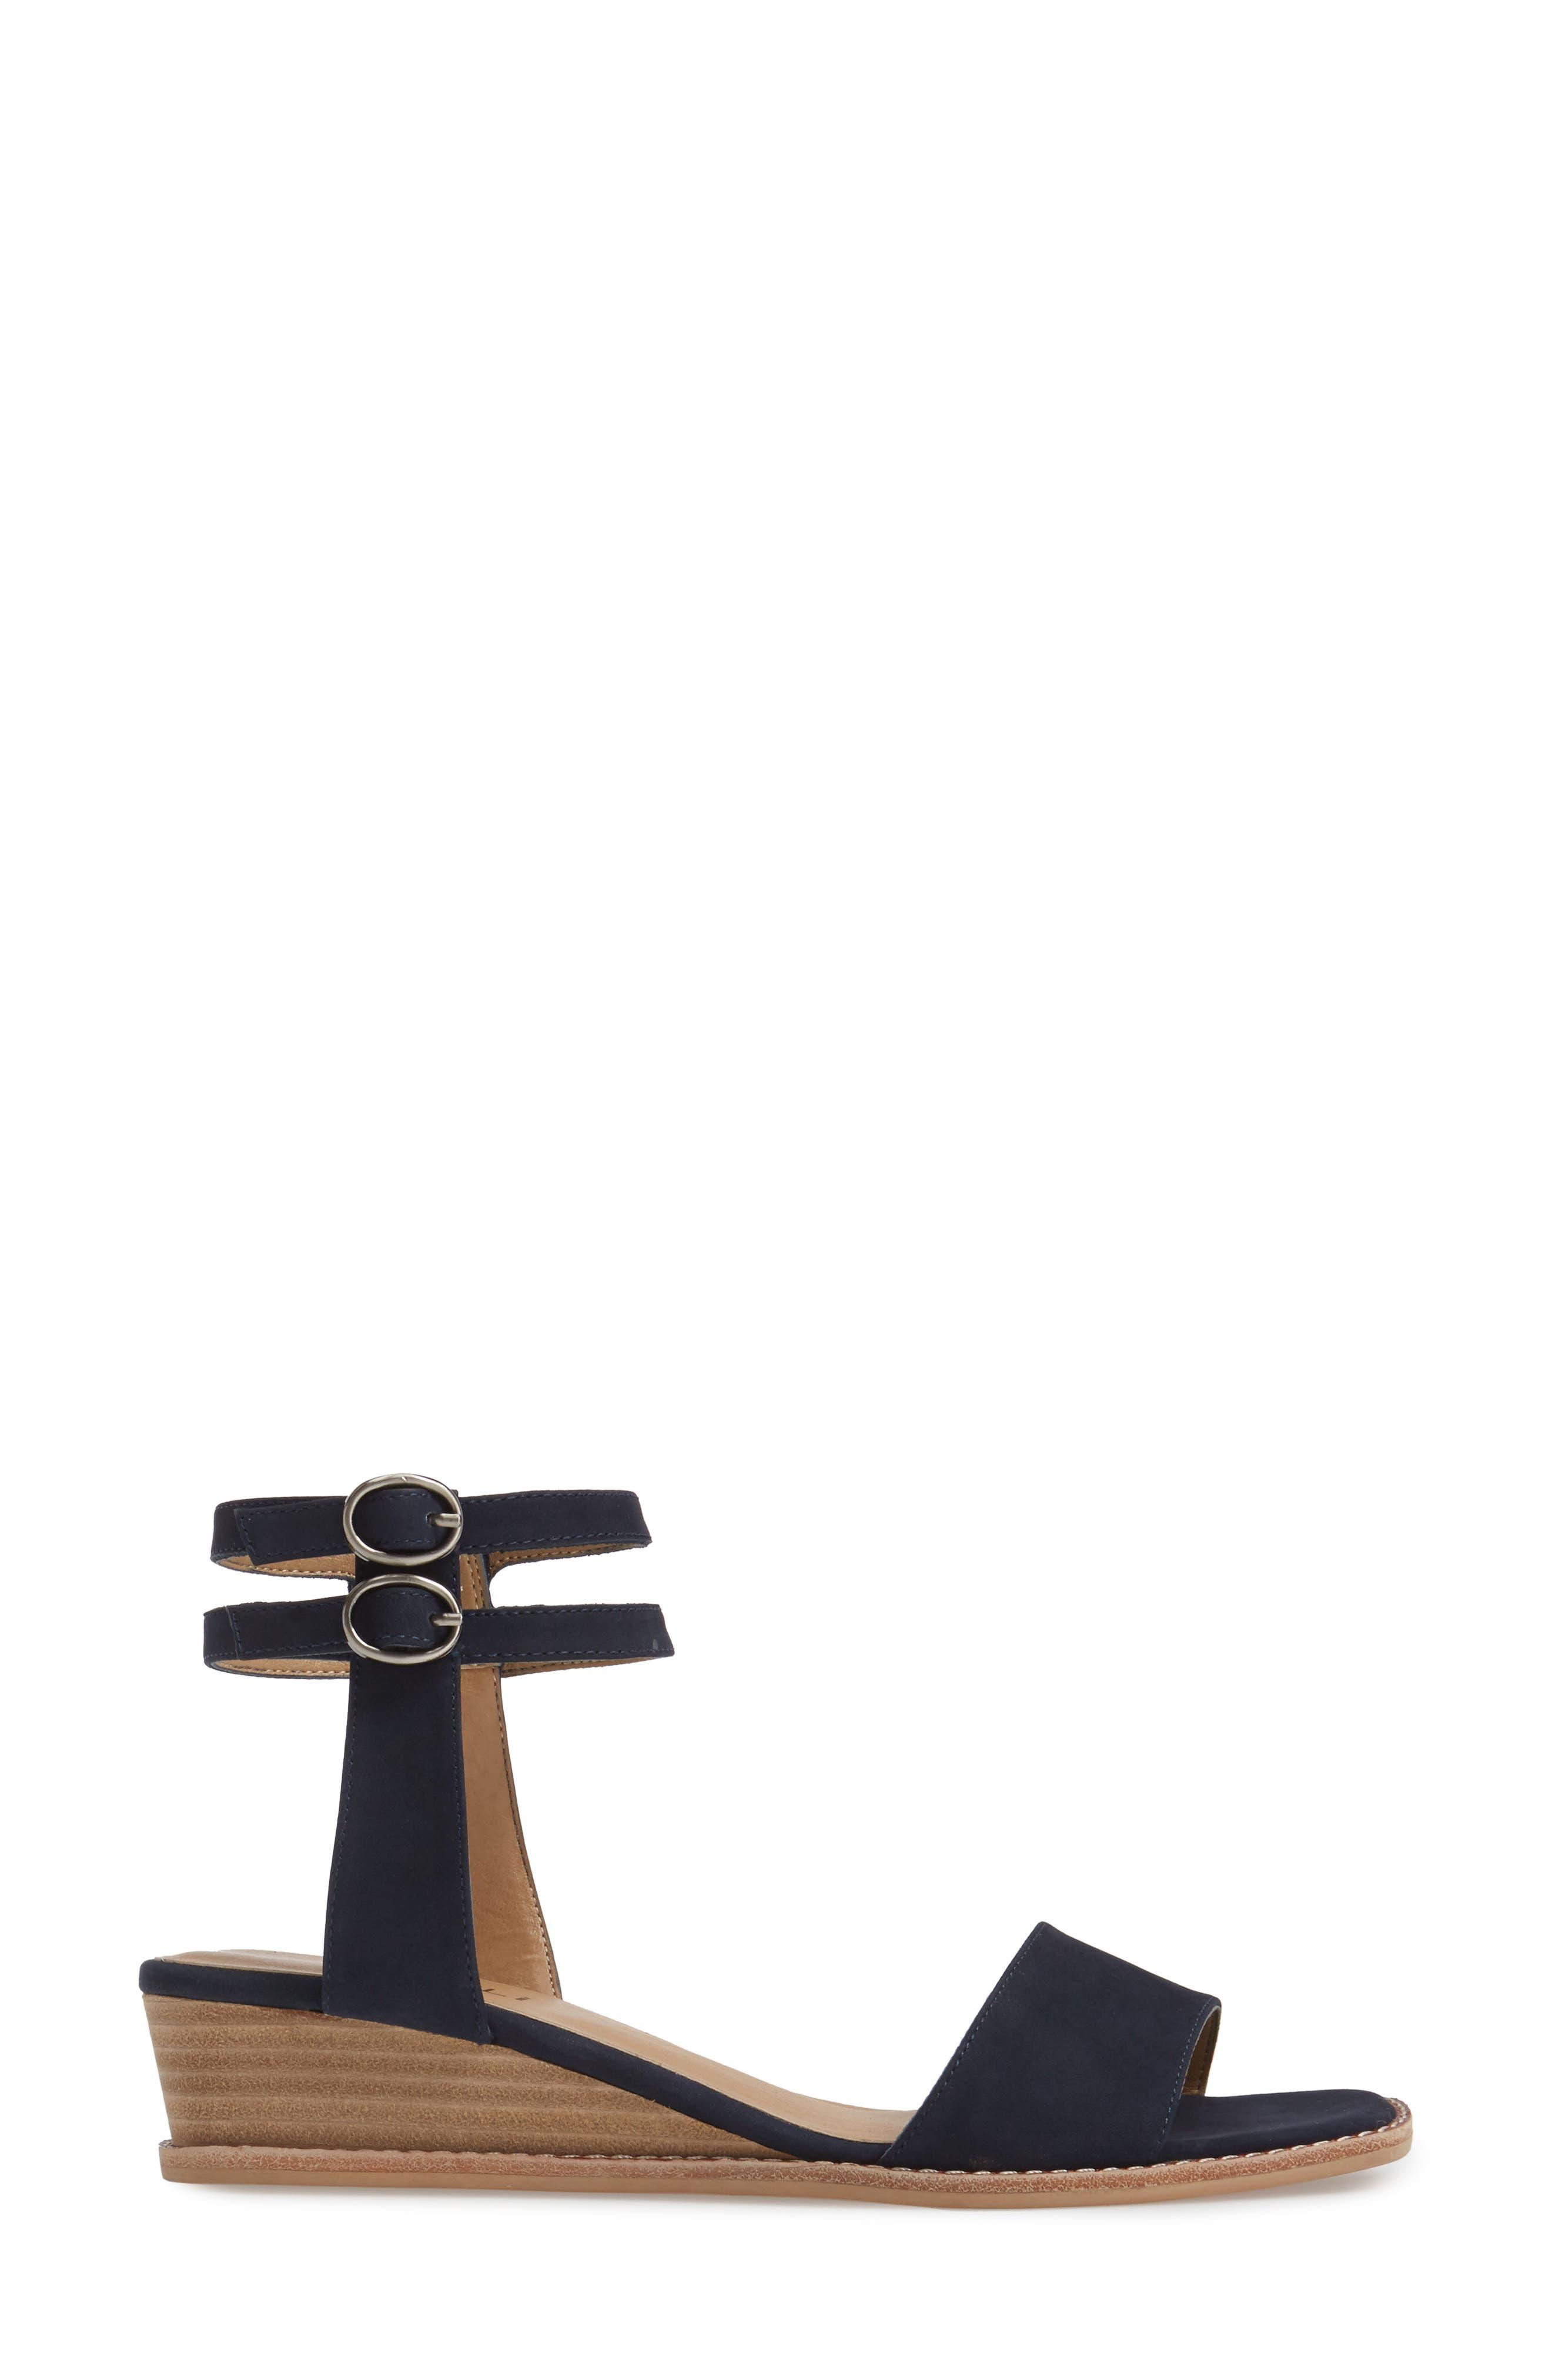 Jarita Ankle Strap Sandal,                             Alternate thumbnail 3, color,                             Navy Leather